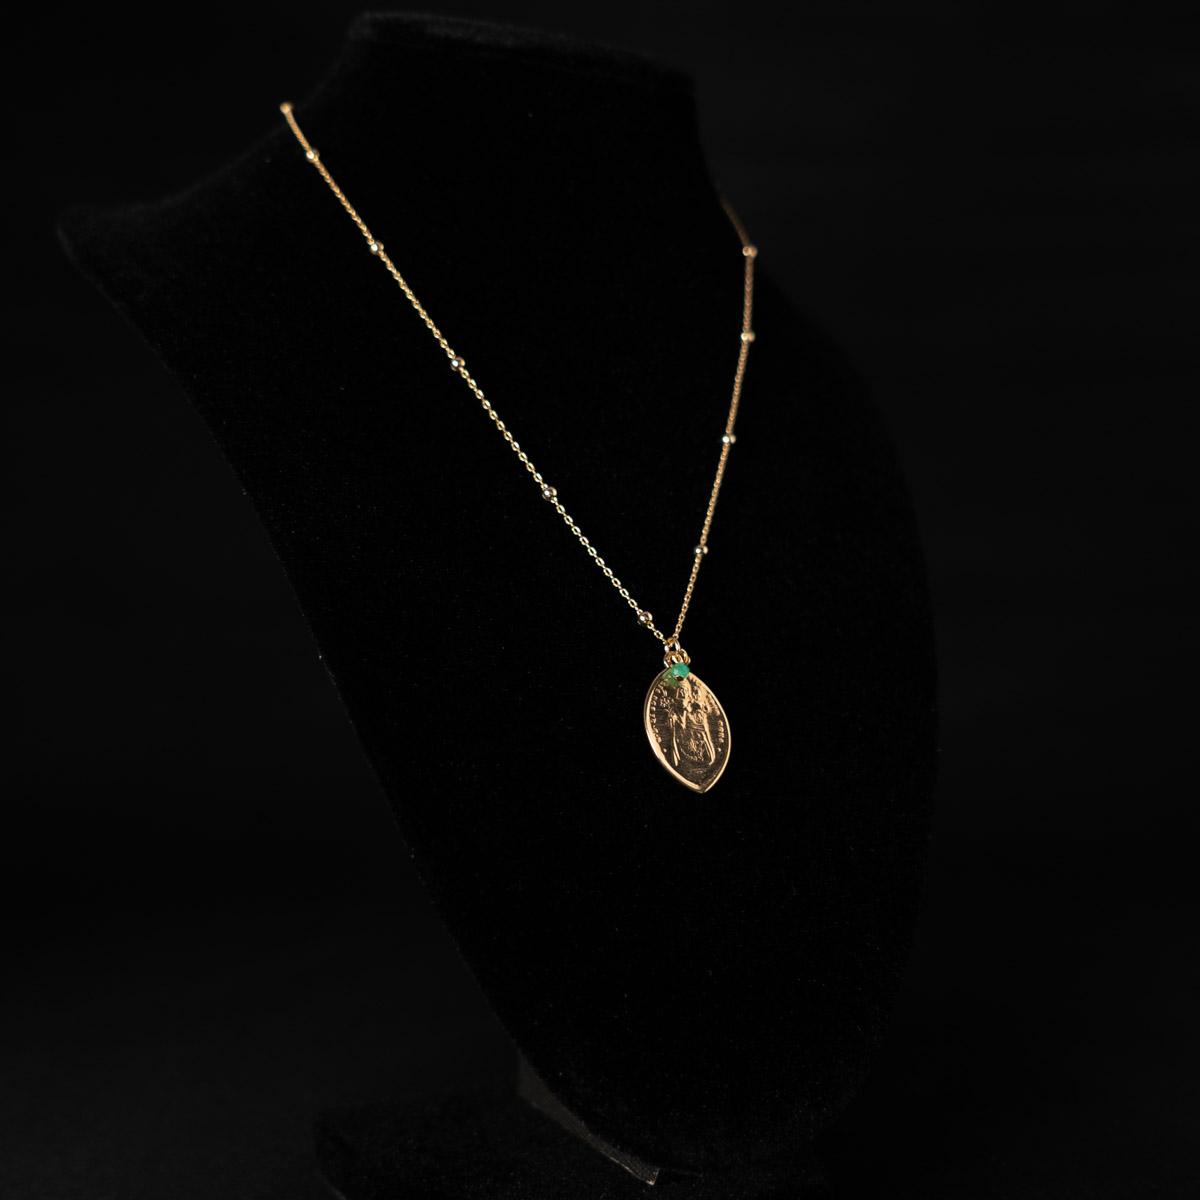 Coeur Envie - collier chaine or - bijoux